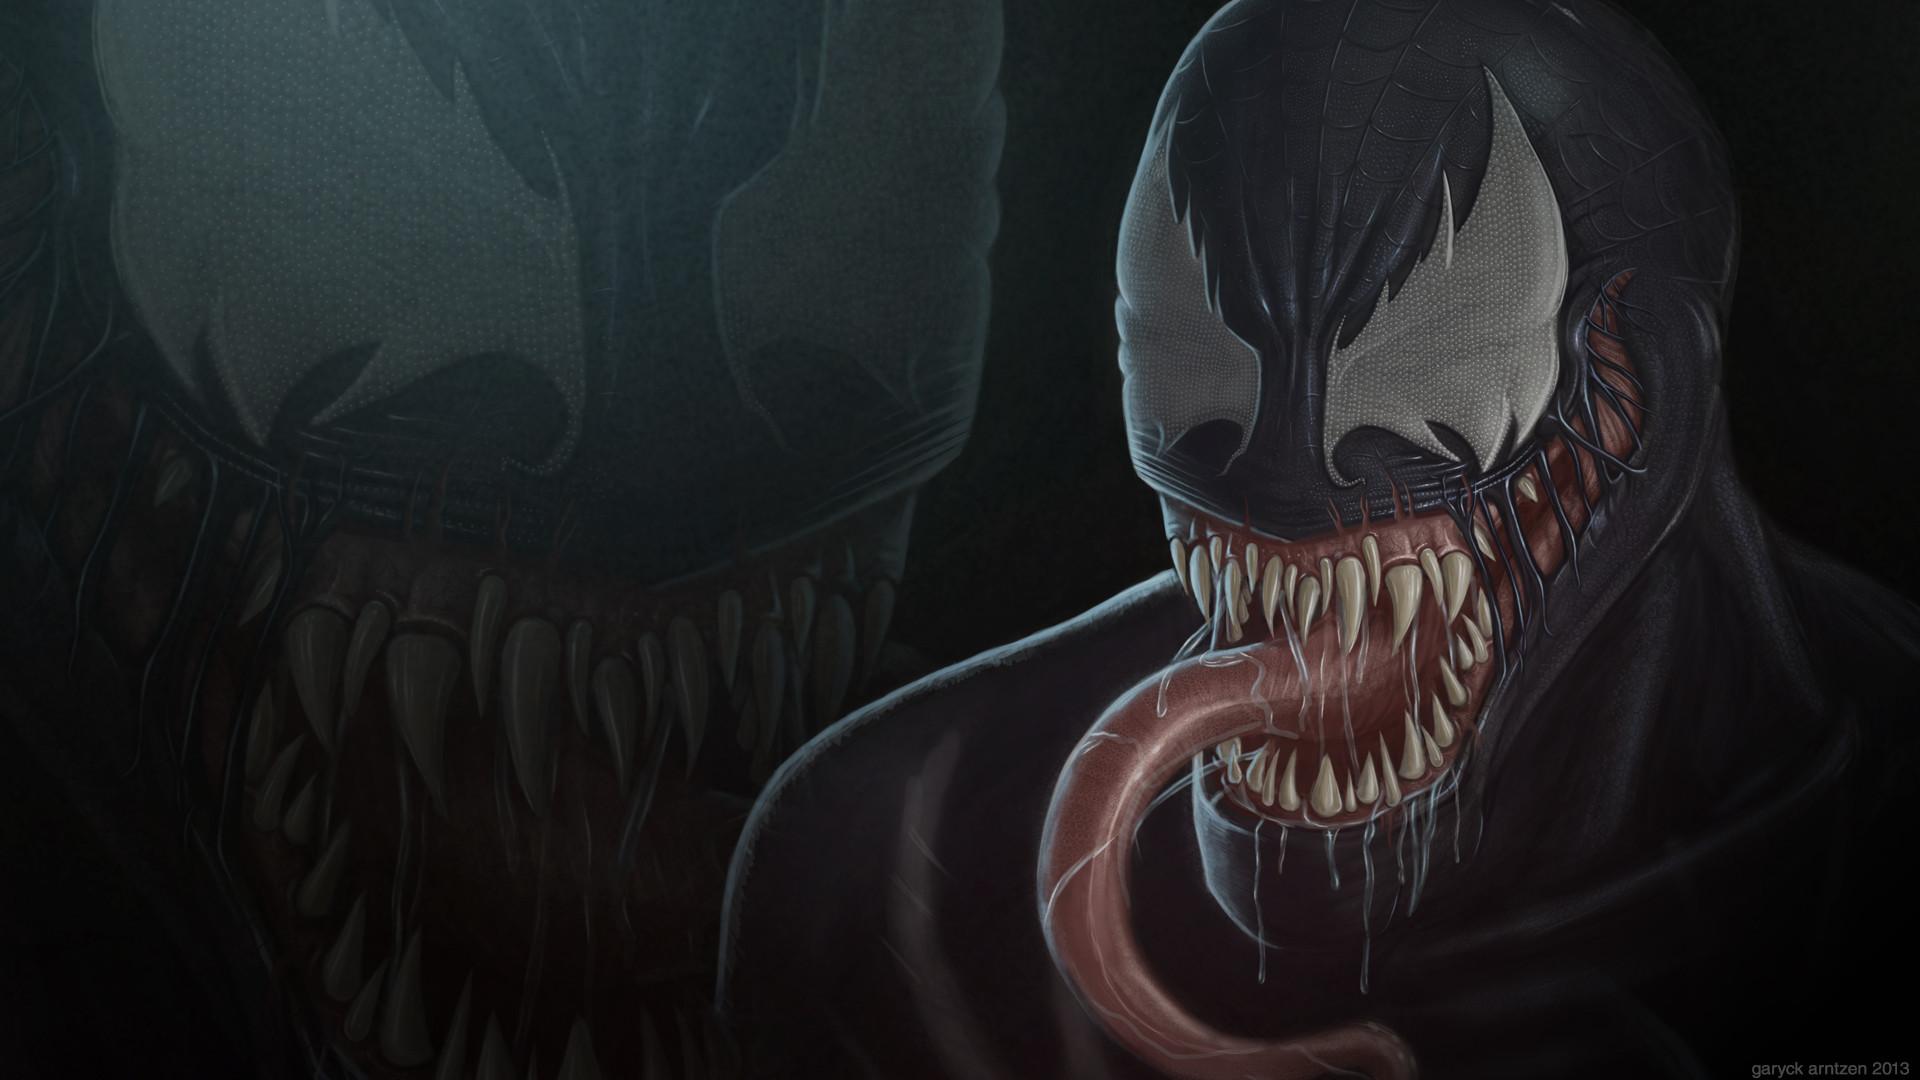 venom wallpaper hd 1920x1080 - photo #12